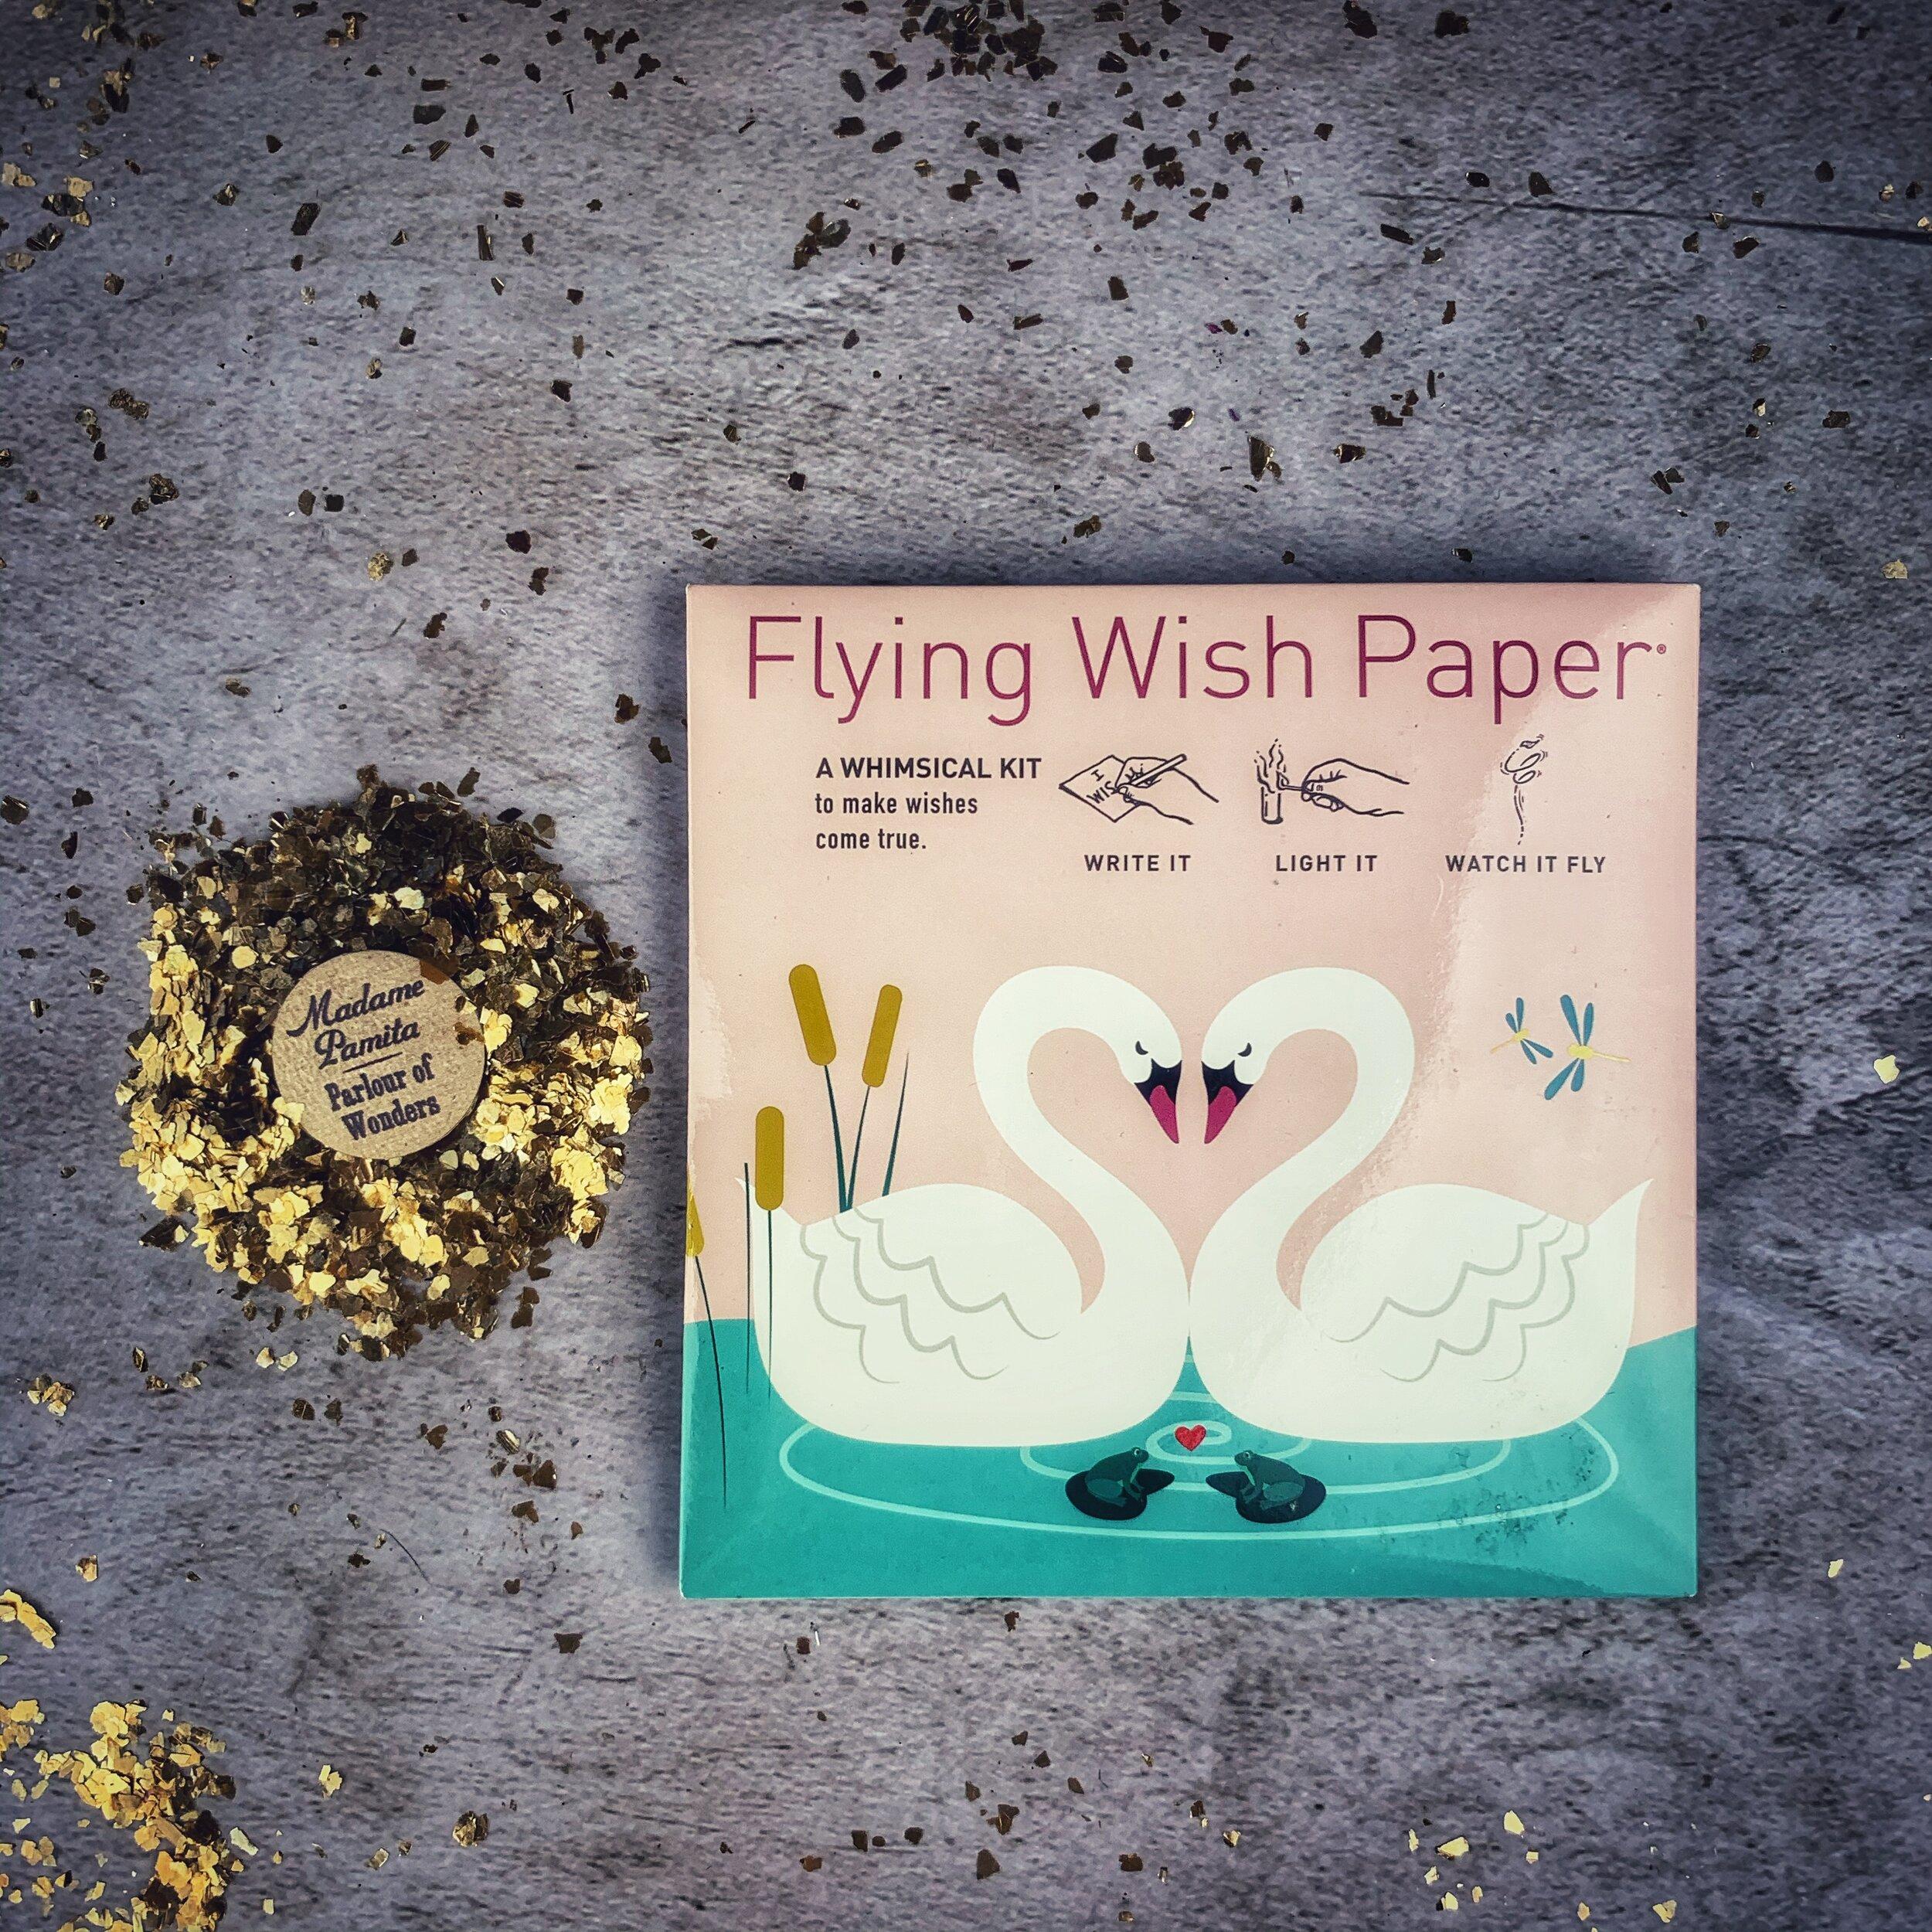 Flying Wish Paper Swan Lake Love Mini Kit — Madame Pamita's Parlour of  Wonders